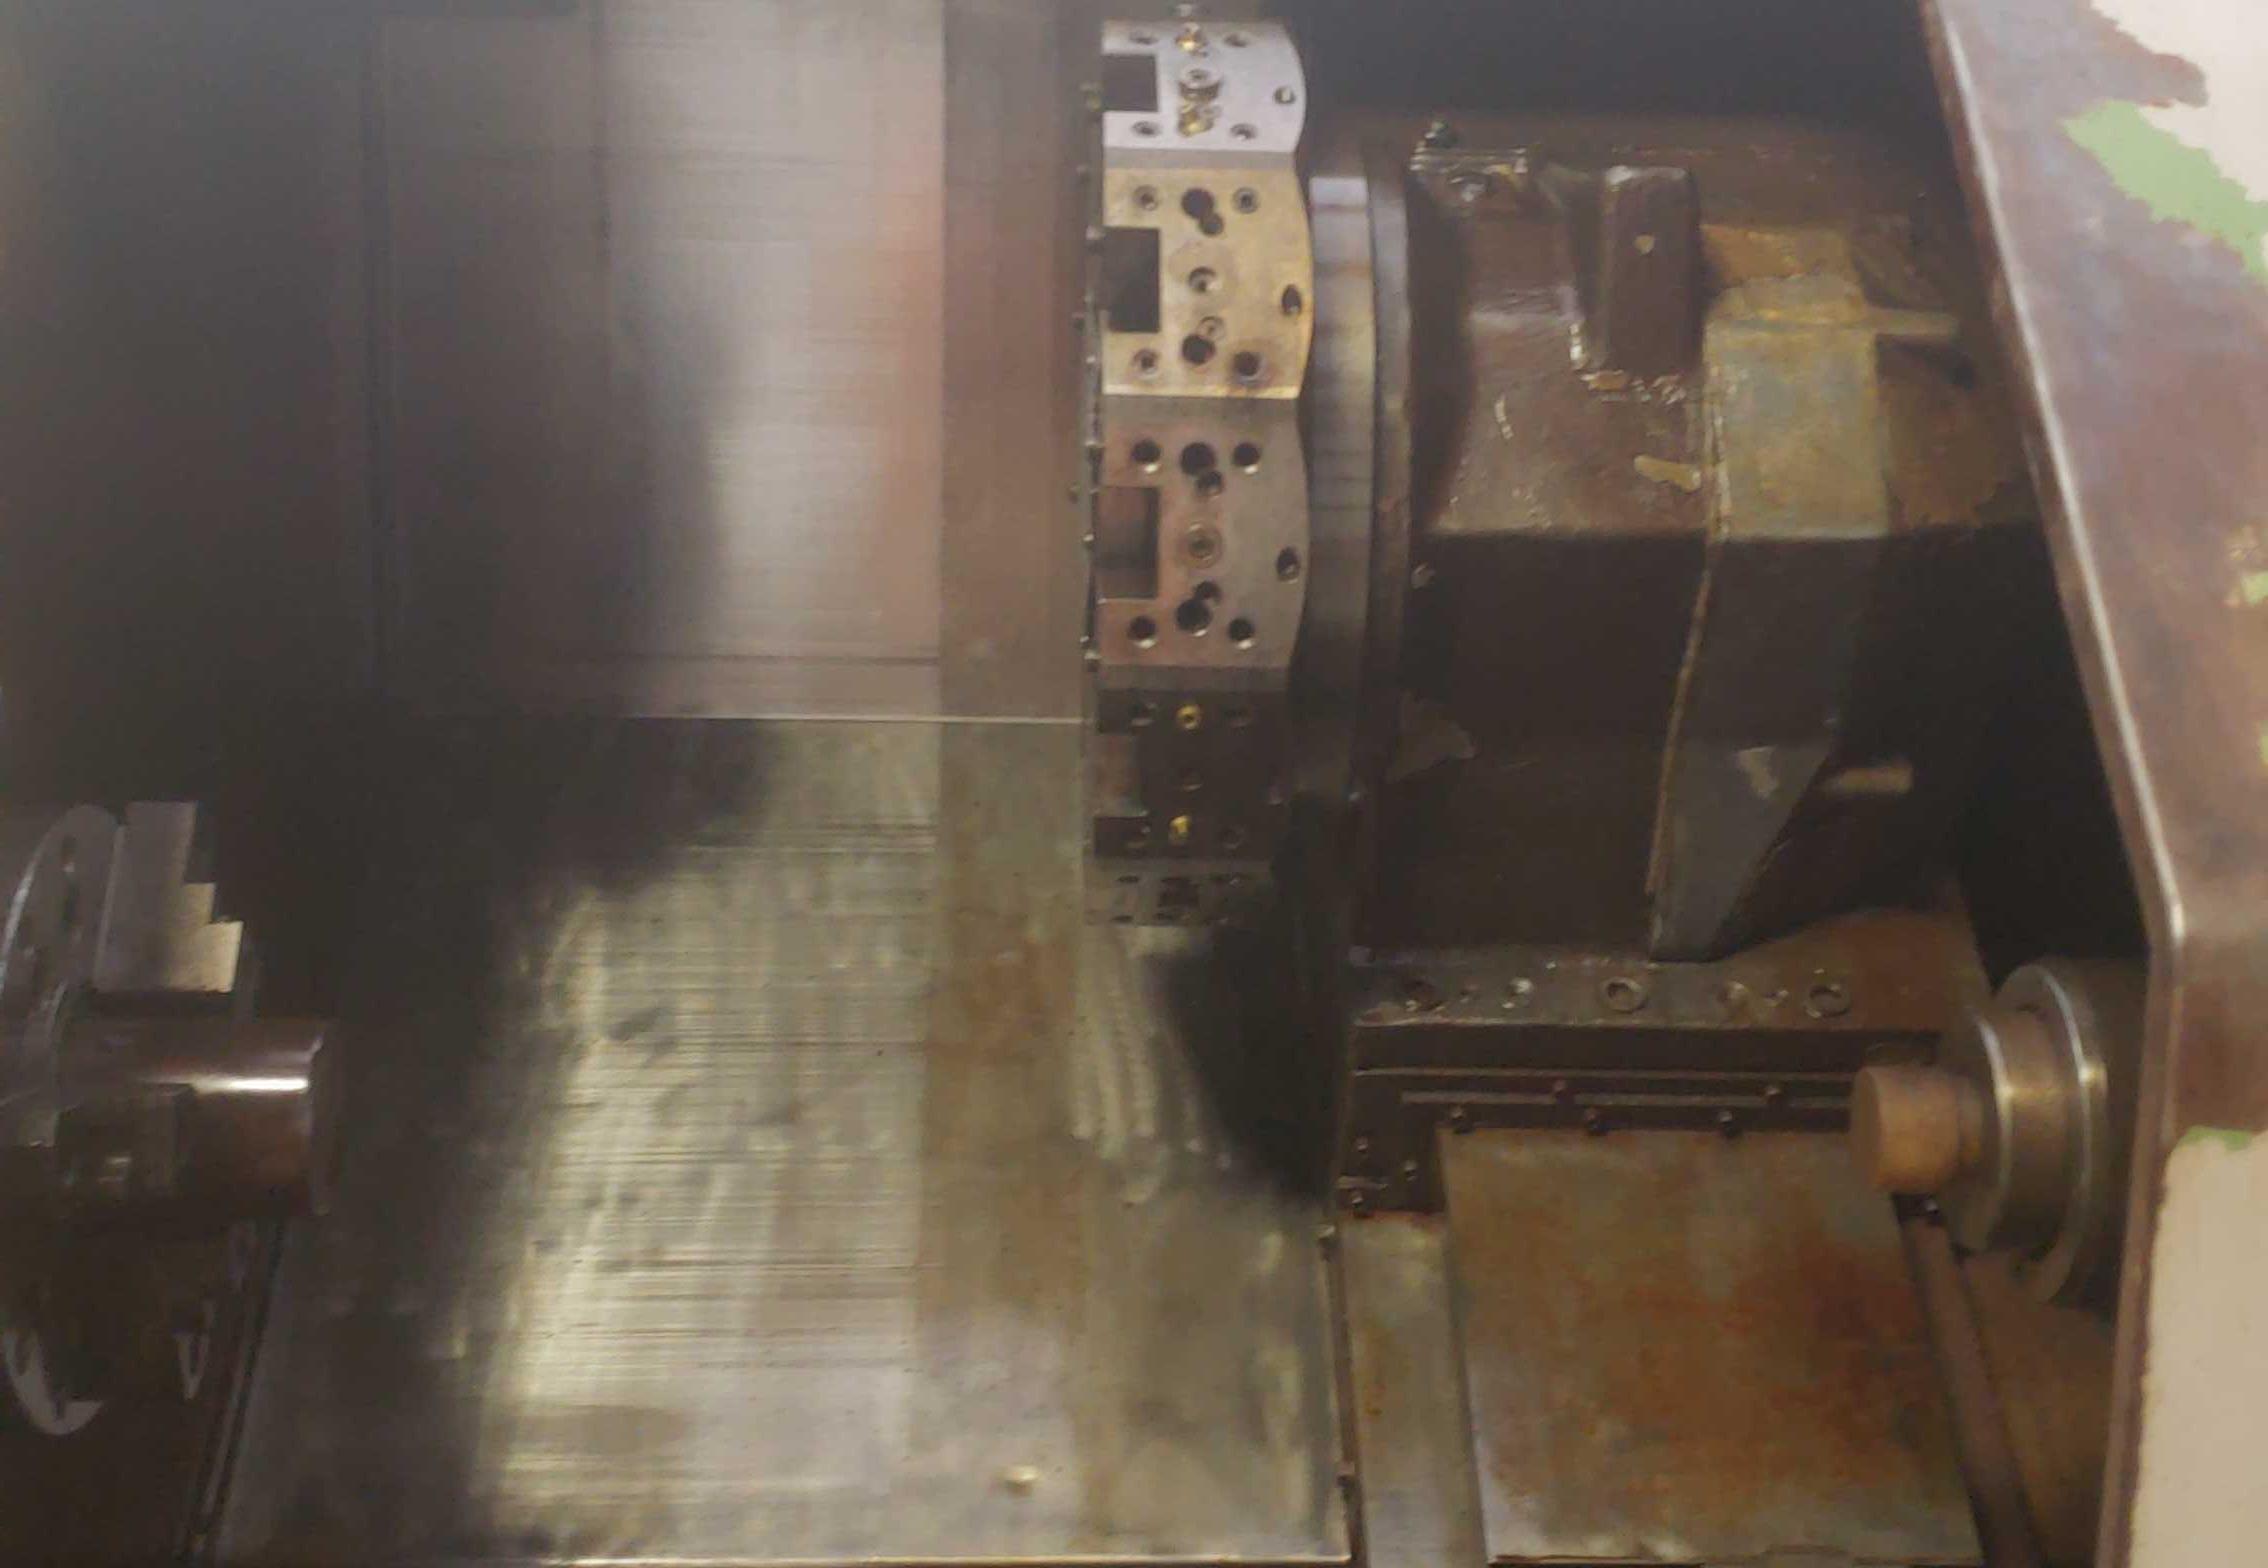 "Okuma LB 25 2 Axis CNC lathe, 5020 control, chip conveyor, 10"" chuck SN: 06119625 - Image 2 of 7"